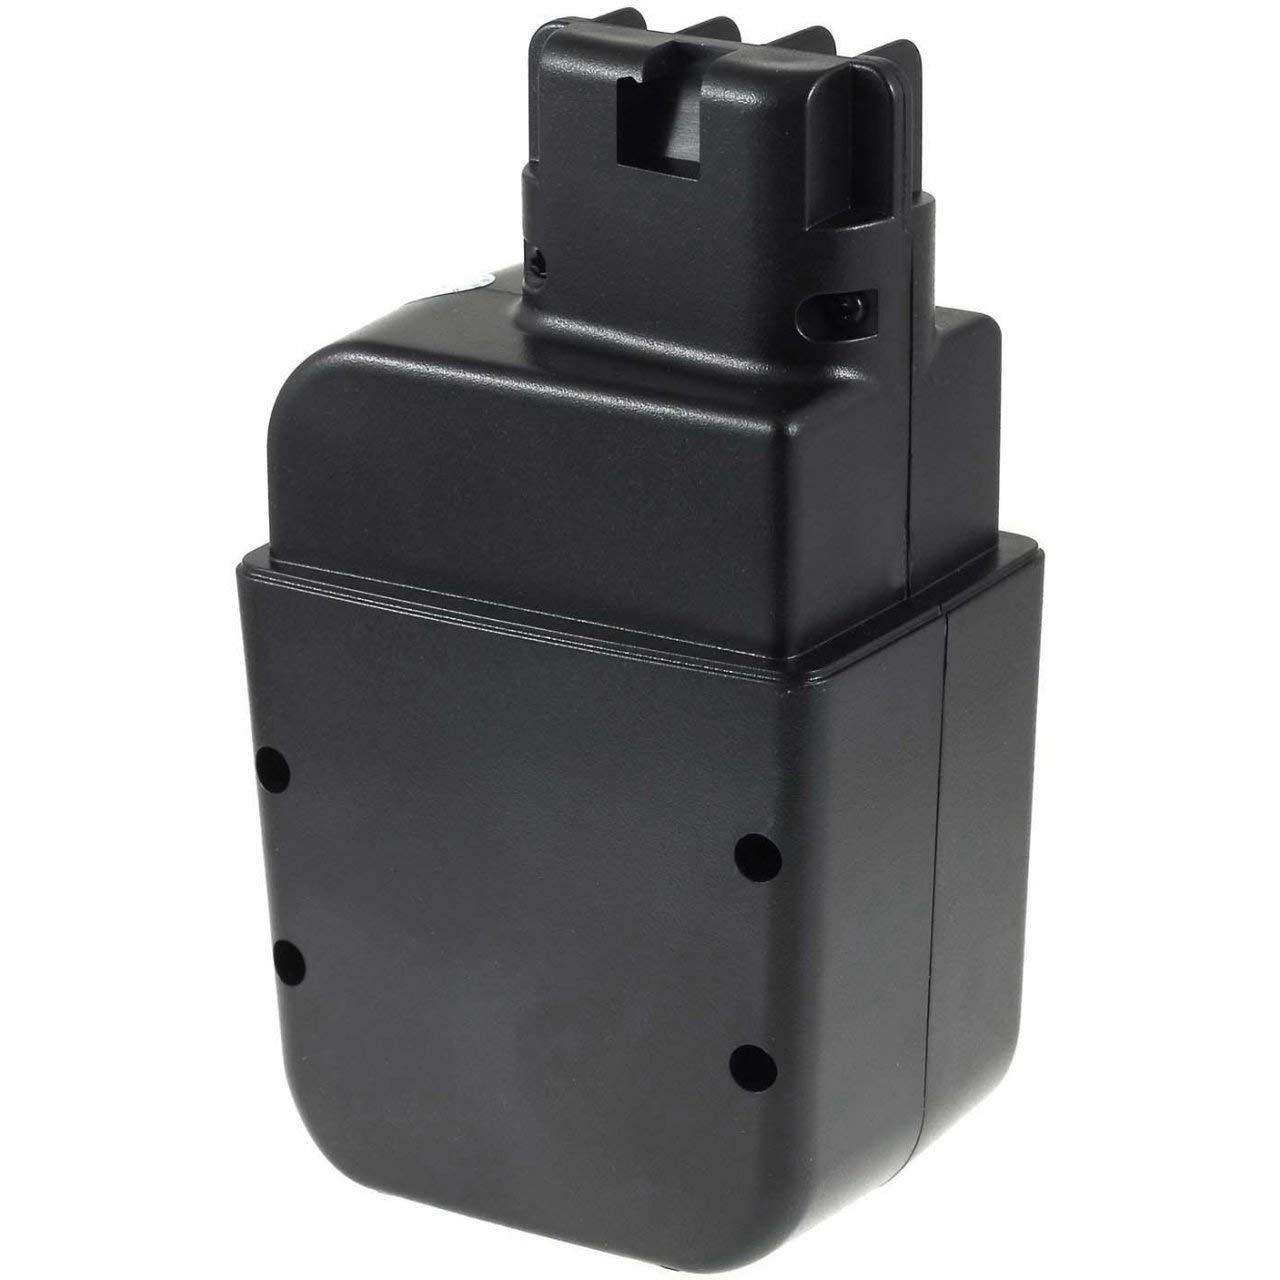 12V NiCd PlanaKontakte Bater/ía para metabo Taladro percutor Sb EA112 //2R+L